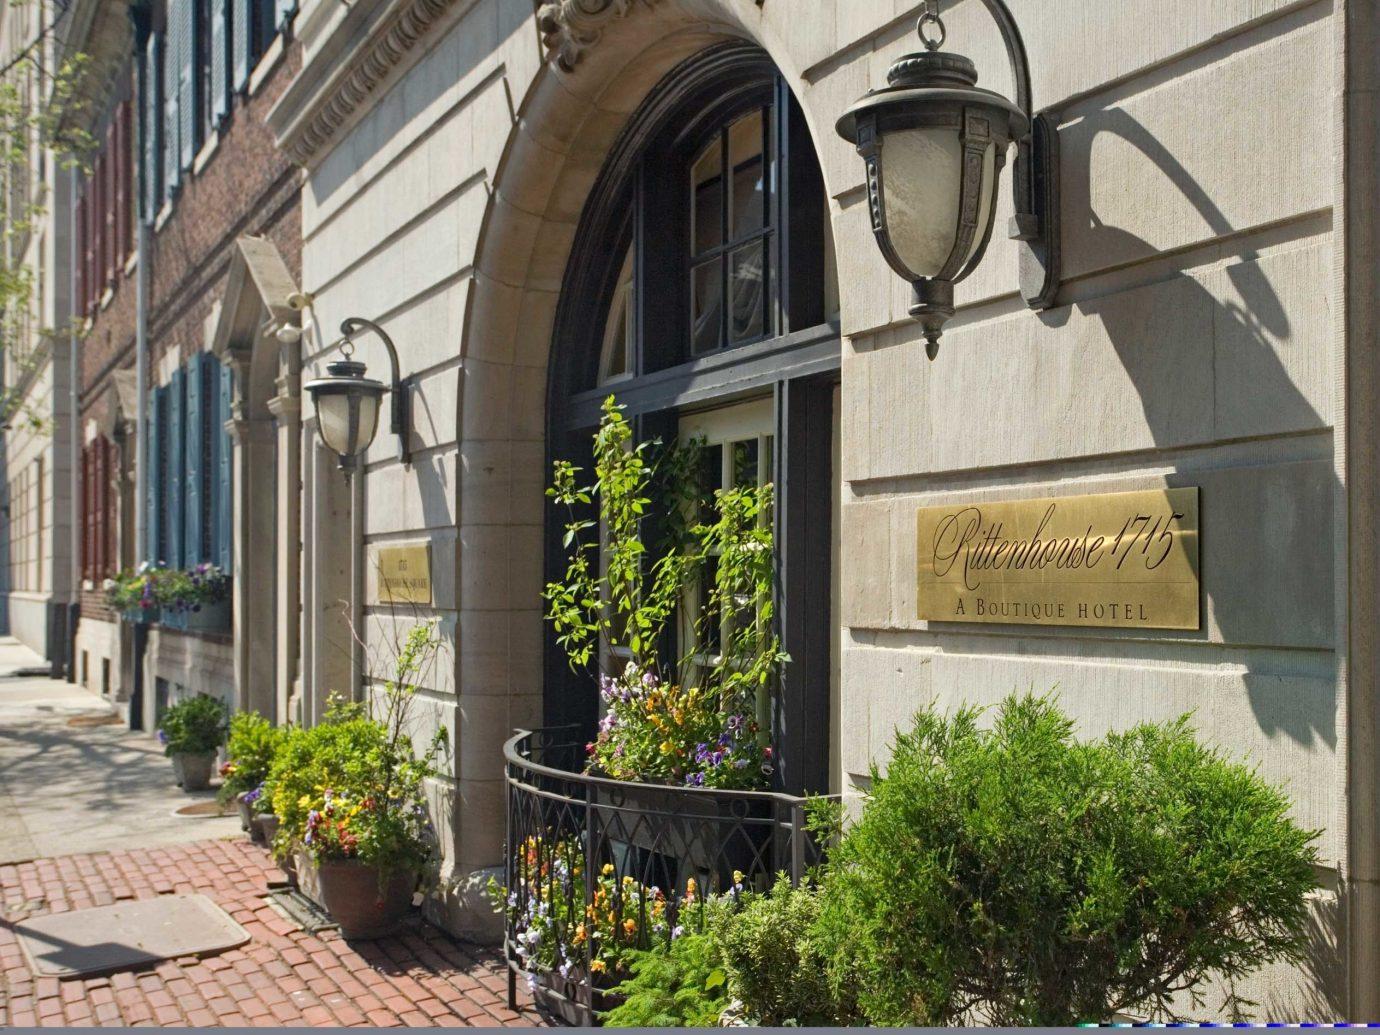 Boutique Boutique Hotels Classic Elegant Exterior Historic Hotels Inn Philadelphia building outdoor property Architecture facade Courtyard home estate arch window mansion chapel stone Garden